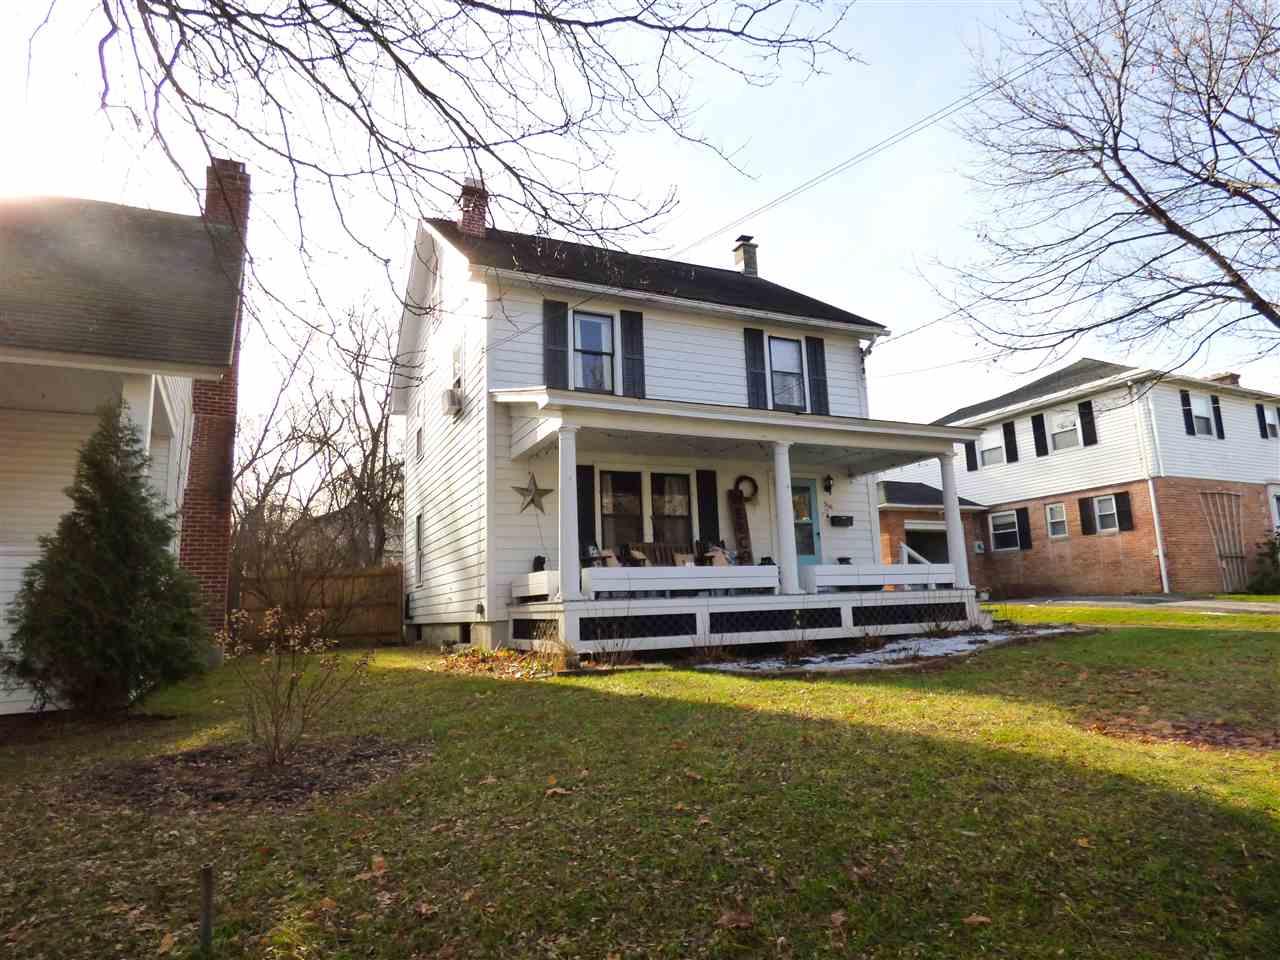 310 elm bennington vt vermont real estate recently